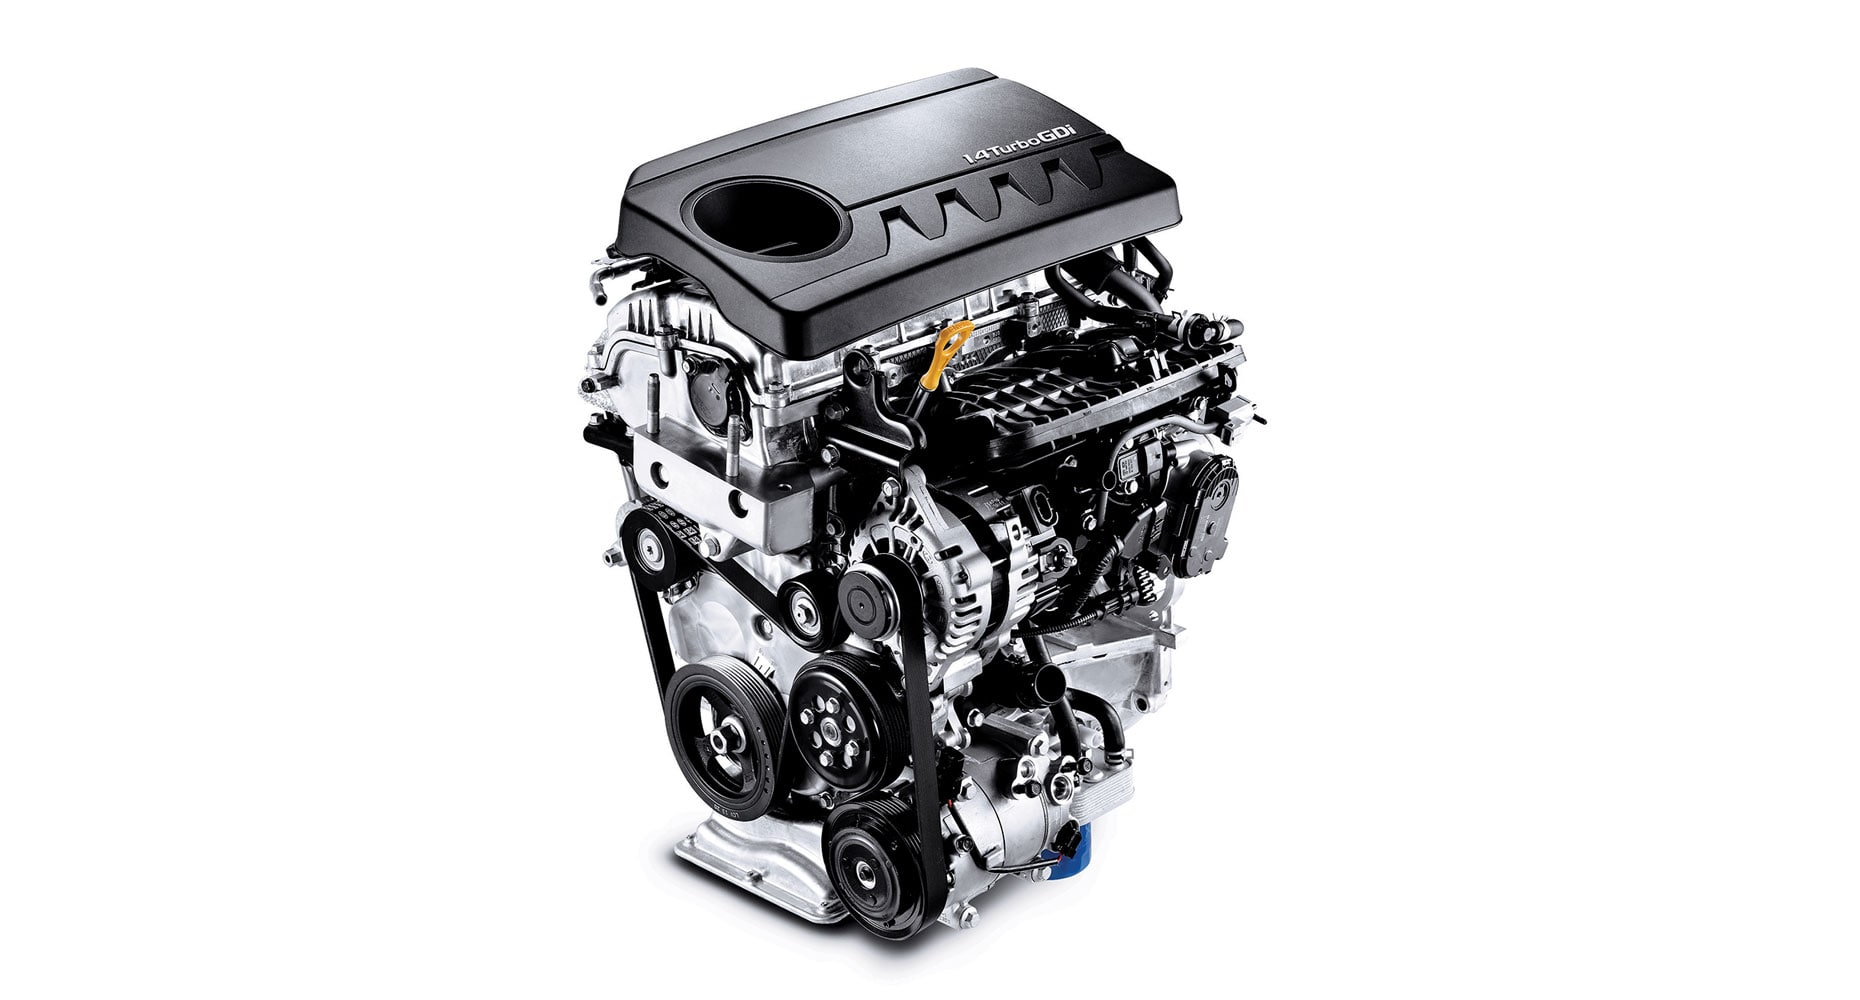 2.0L Atkinson engine